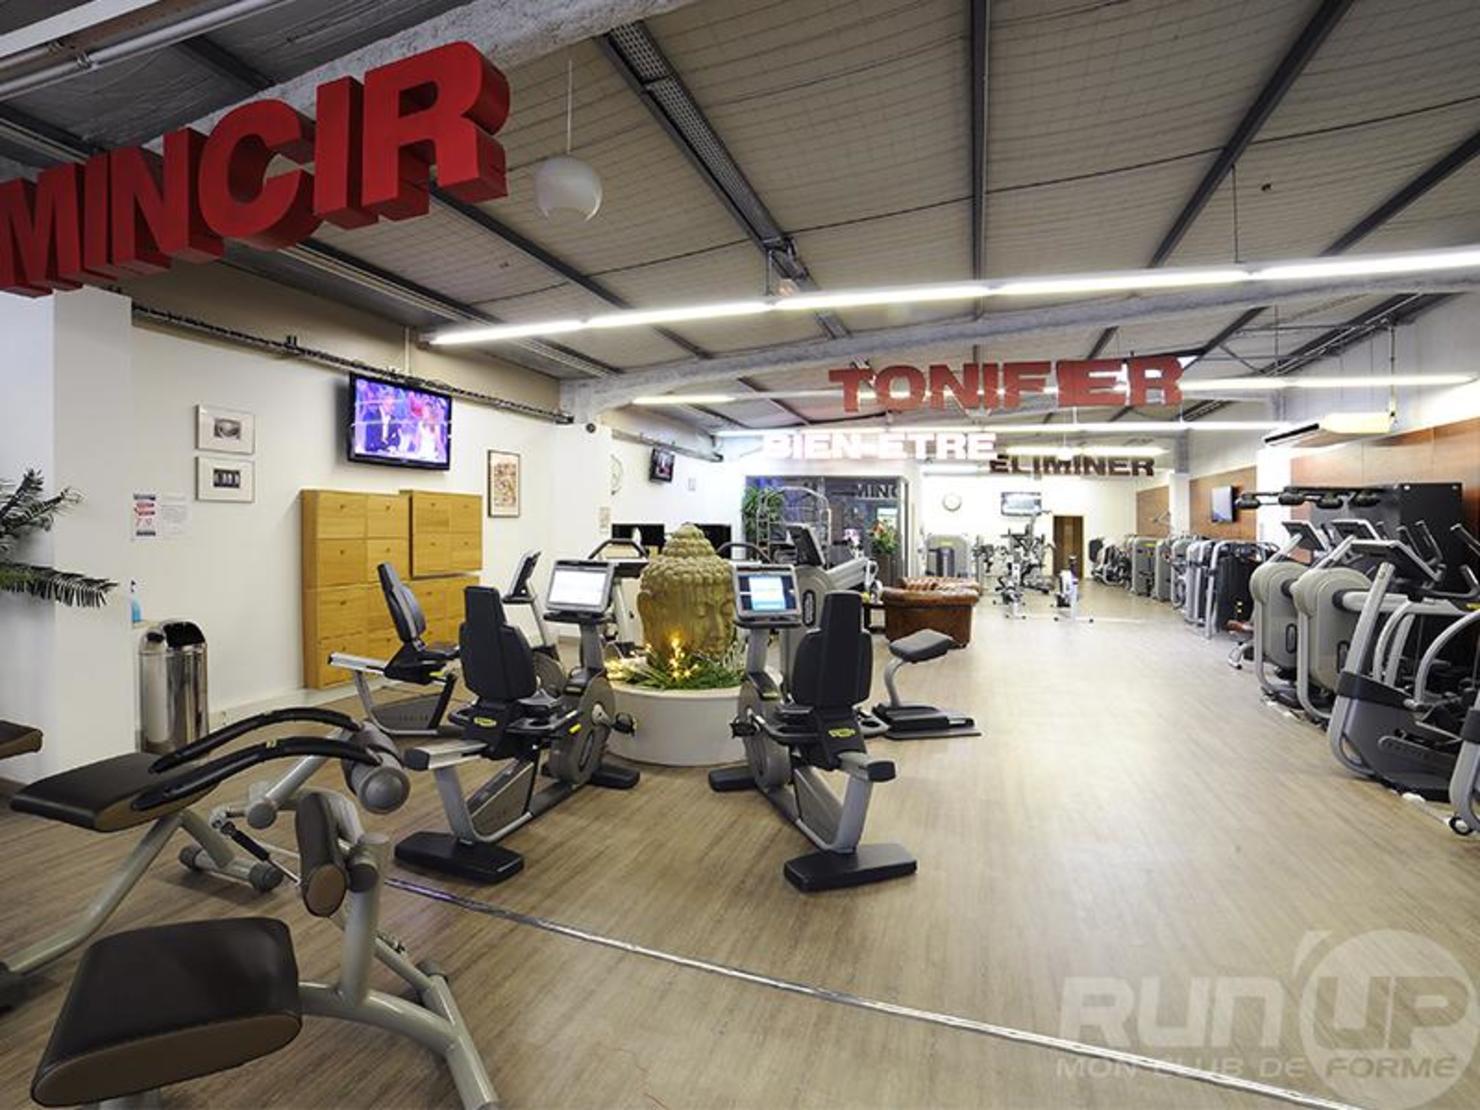 Run 39 up forme montpellier castelnau castelnau le lez - Salle de sport port marianne montpellier ...